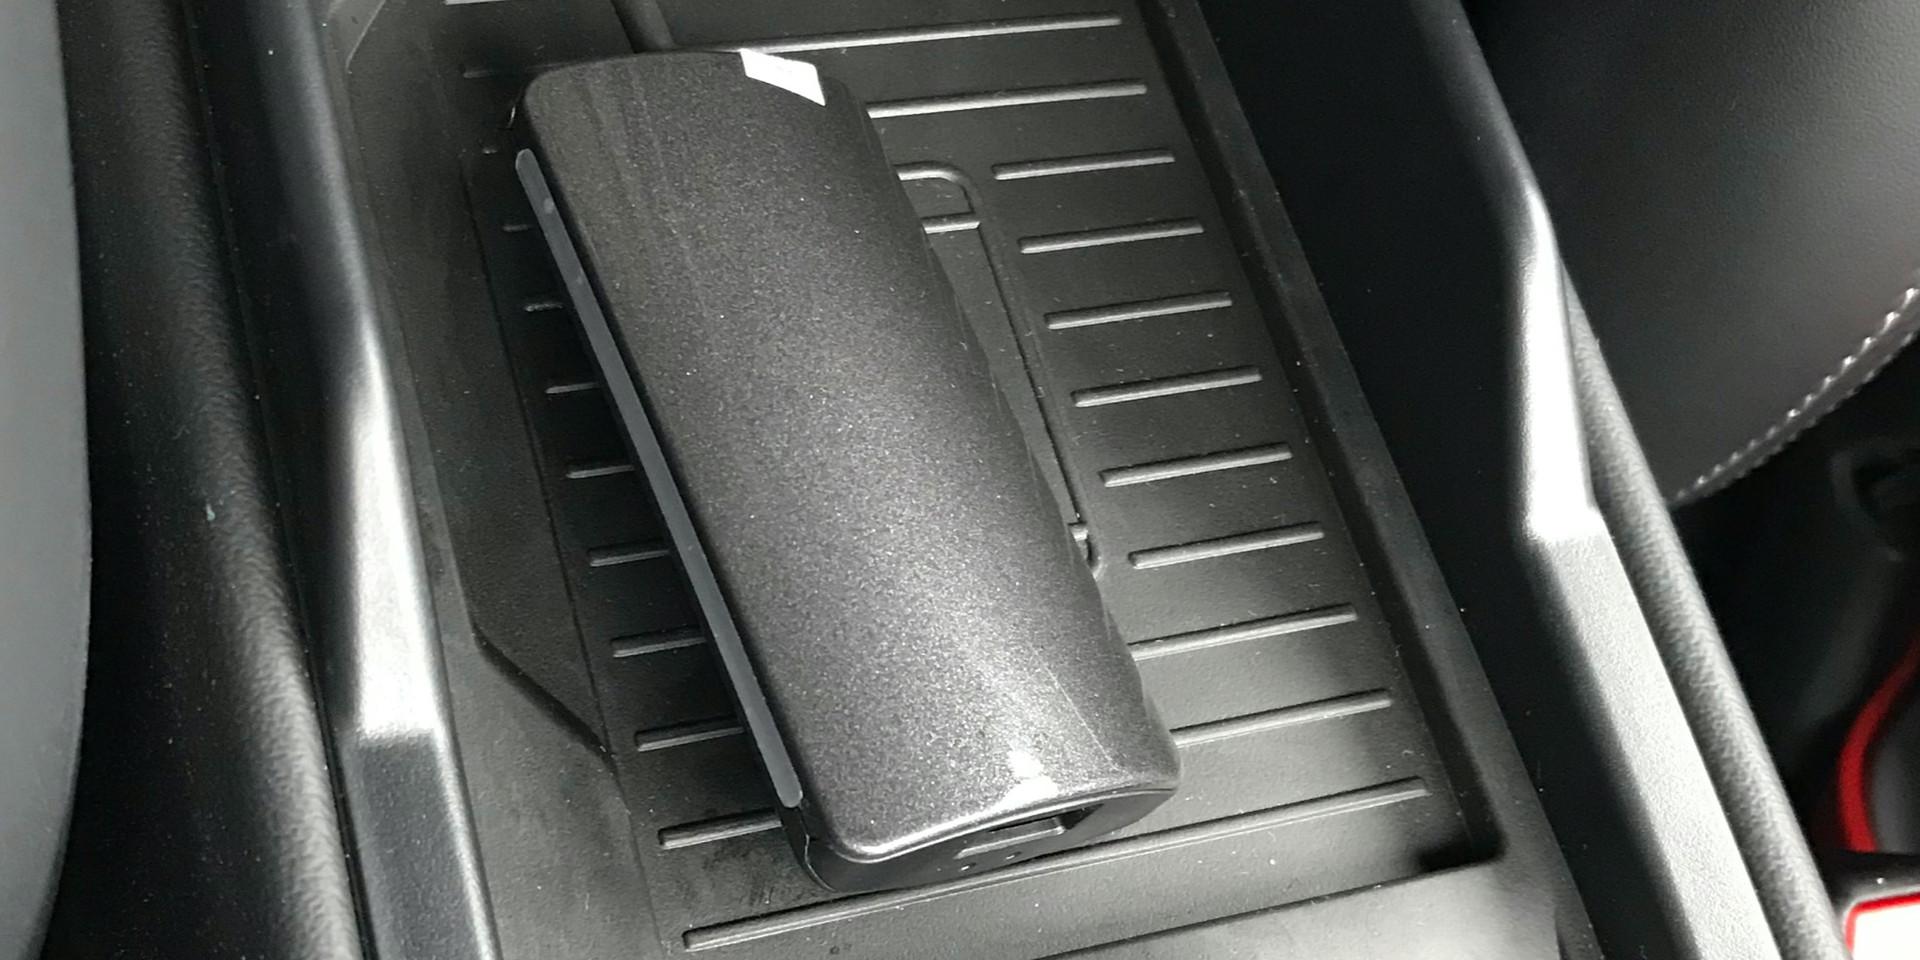 PCM4 - USB Wireless Adapter